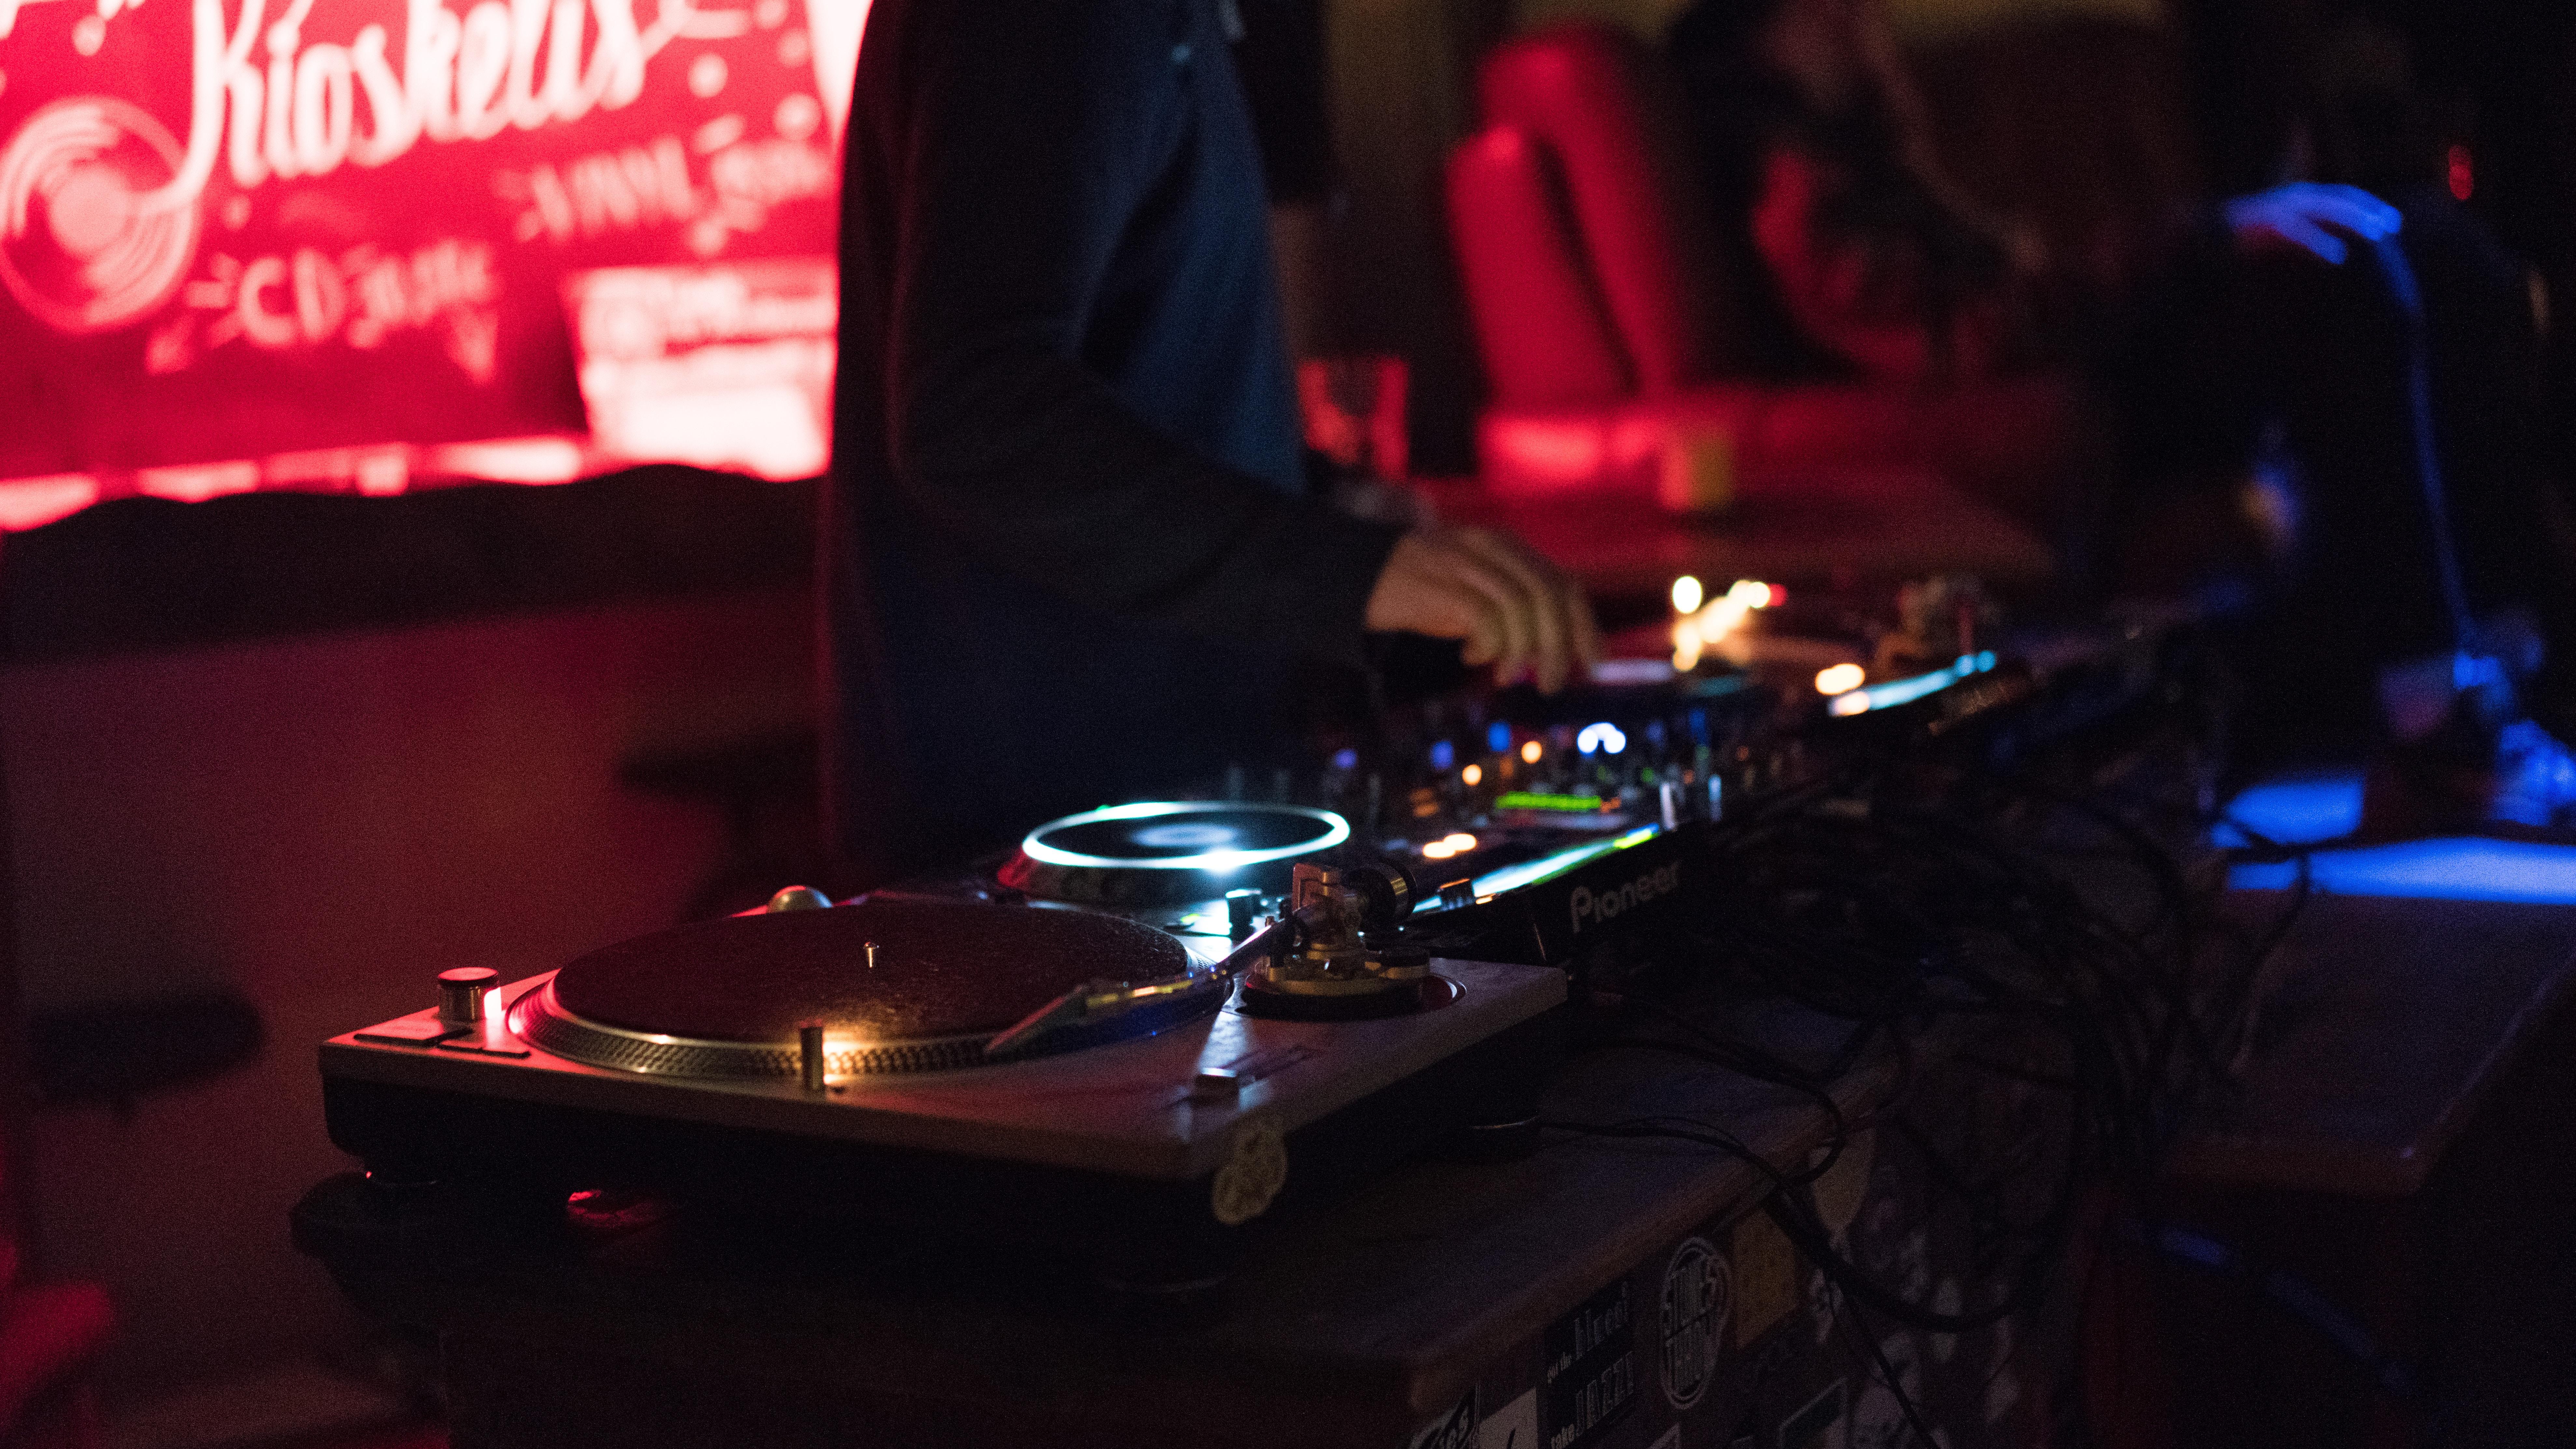 A DJ working their turntable at a club in Klaipėda